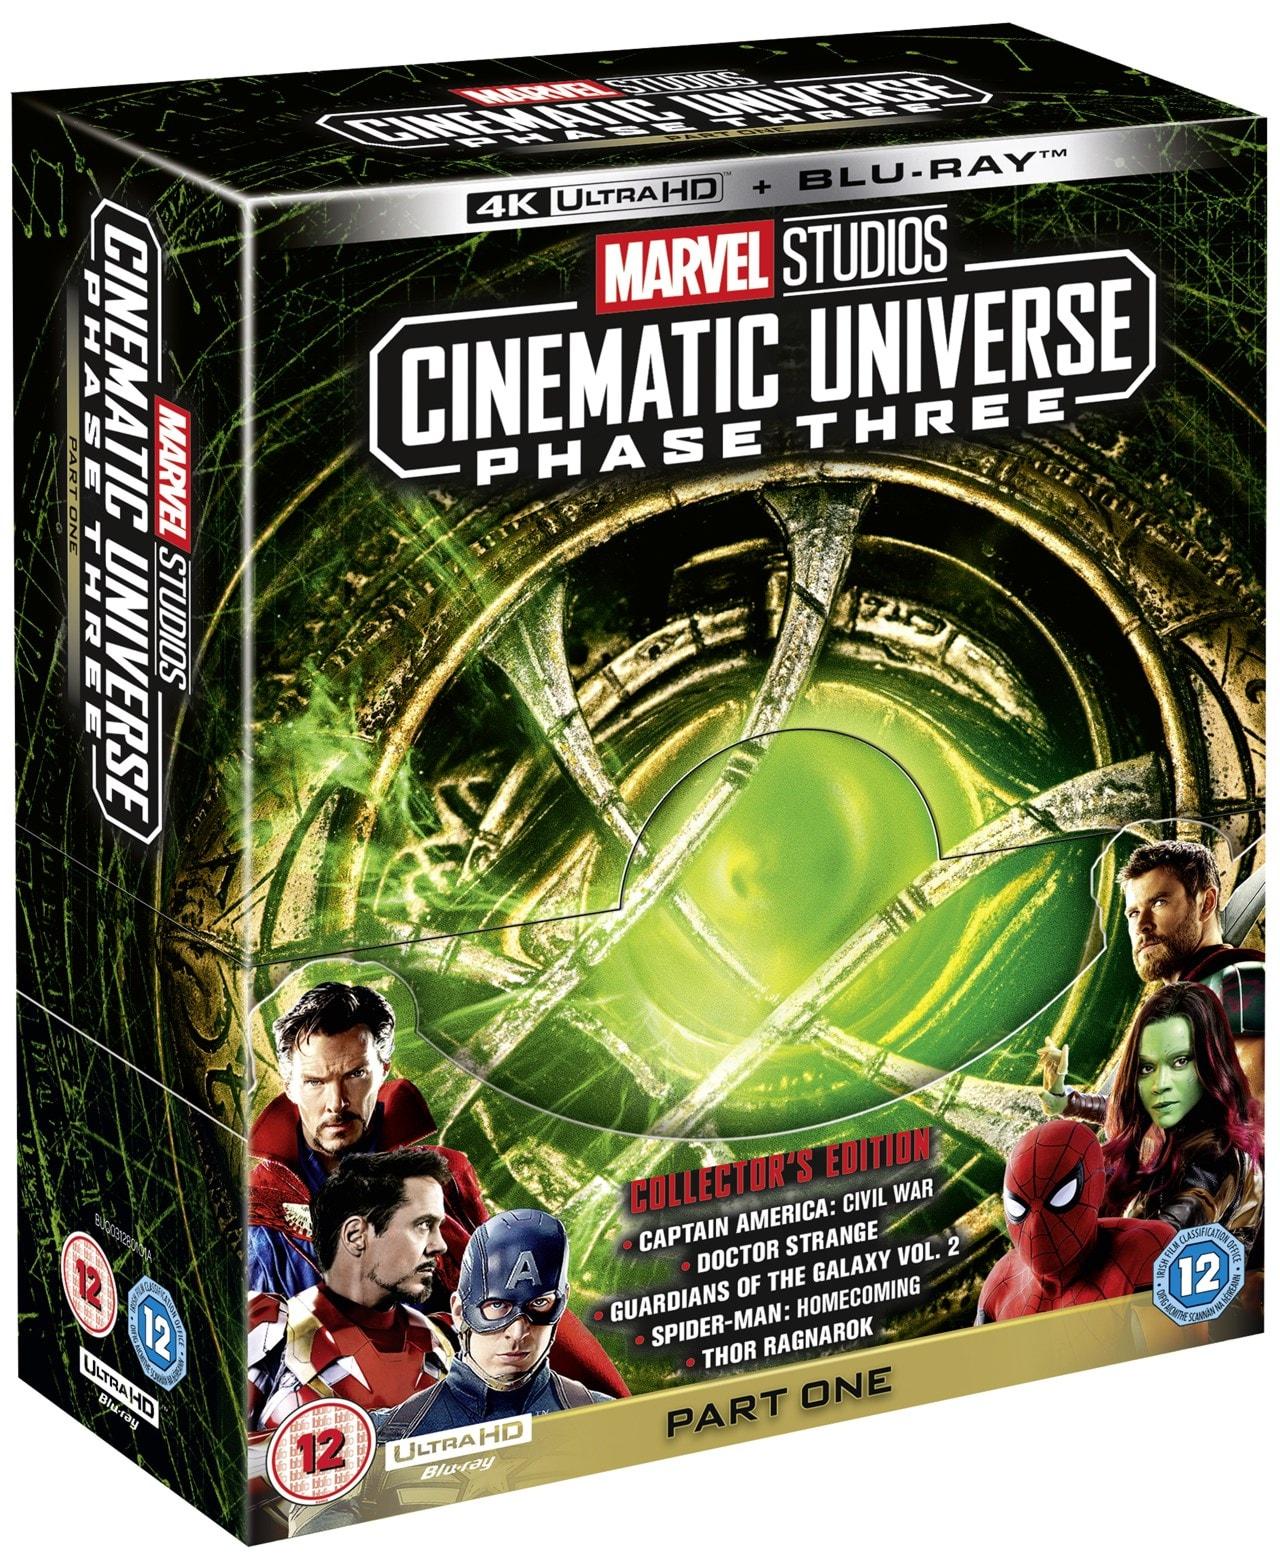 Marvel Studios Cinematic Universe: Phase Three - Part One - 2